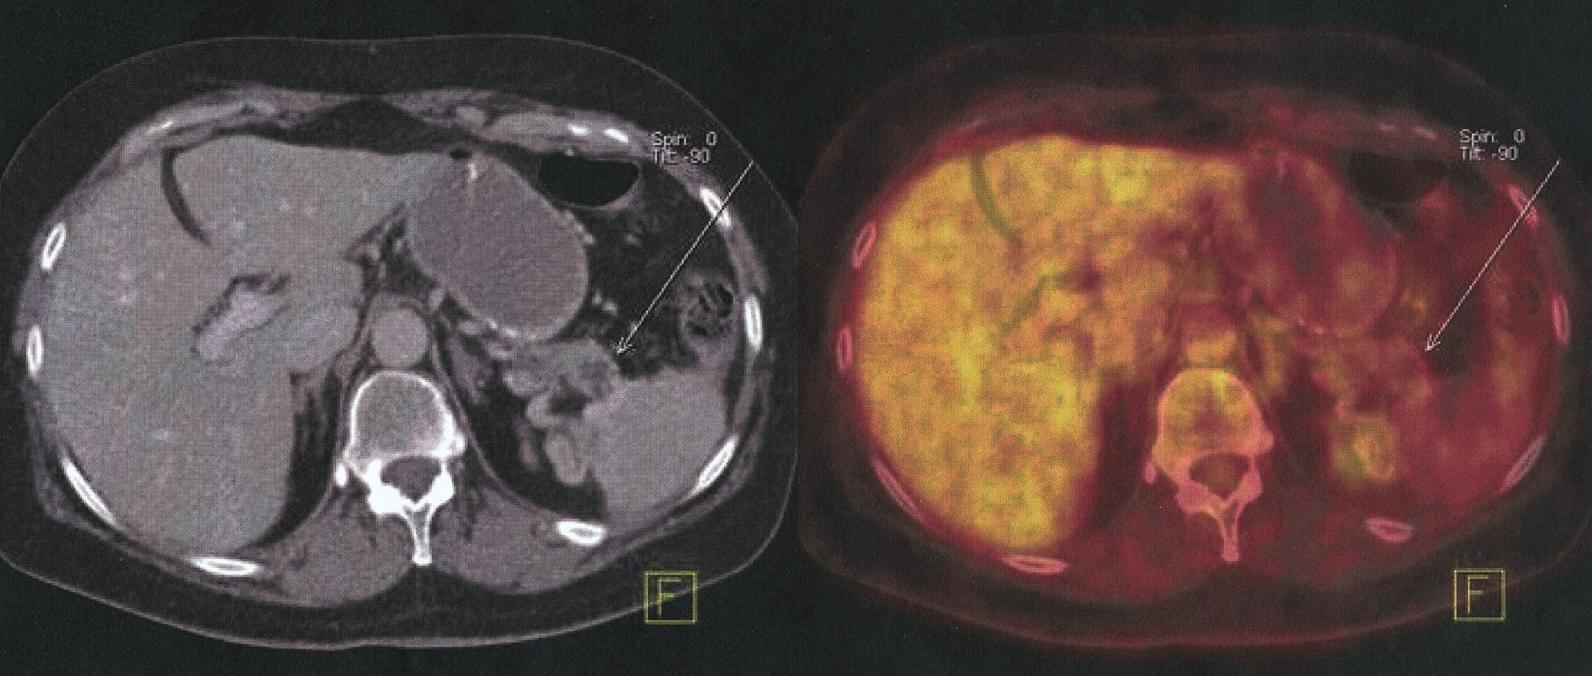 Správná a přesná lokalizace tumoru hlavy pankreatu T2, N0, M0 Fig. l. Correct and precise localization of pancreatic head tumour T2, N0, M0